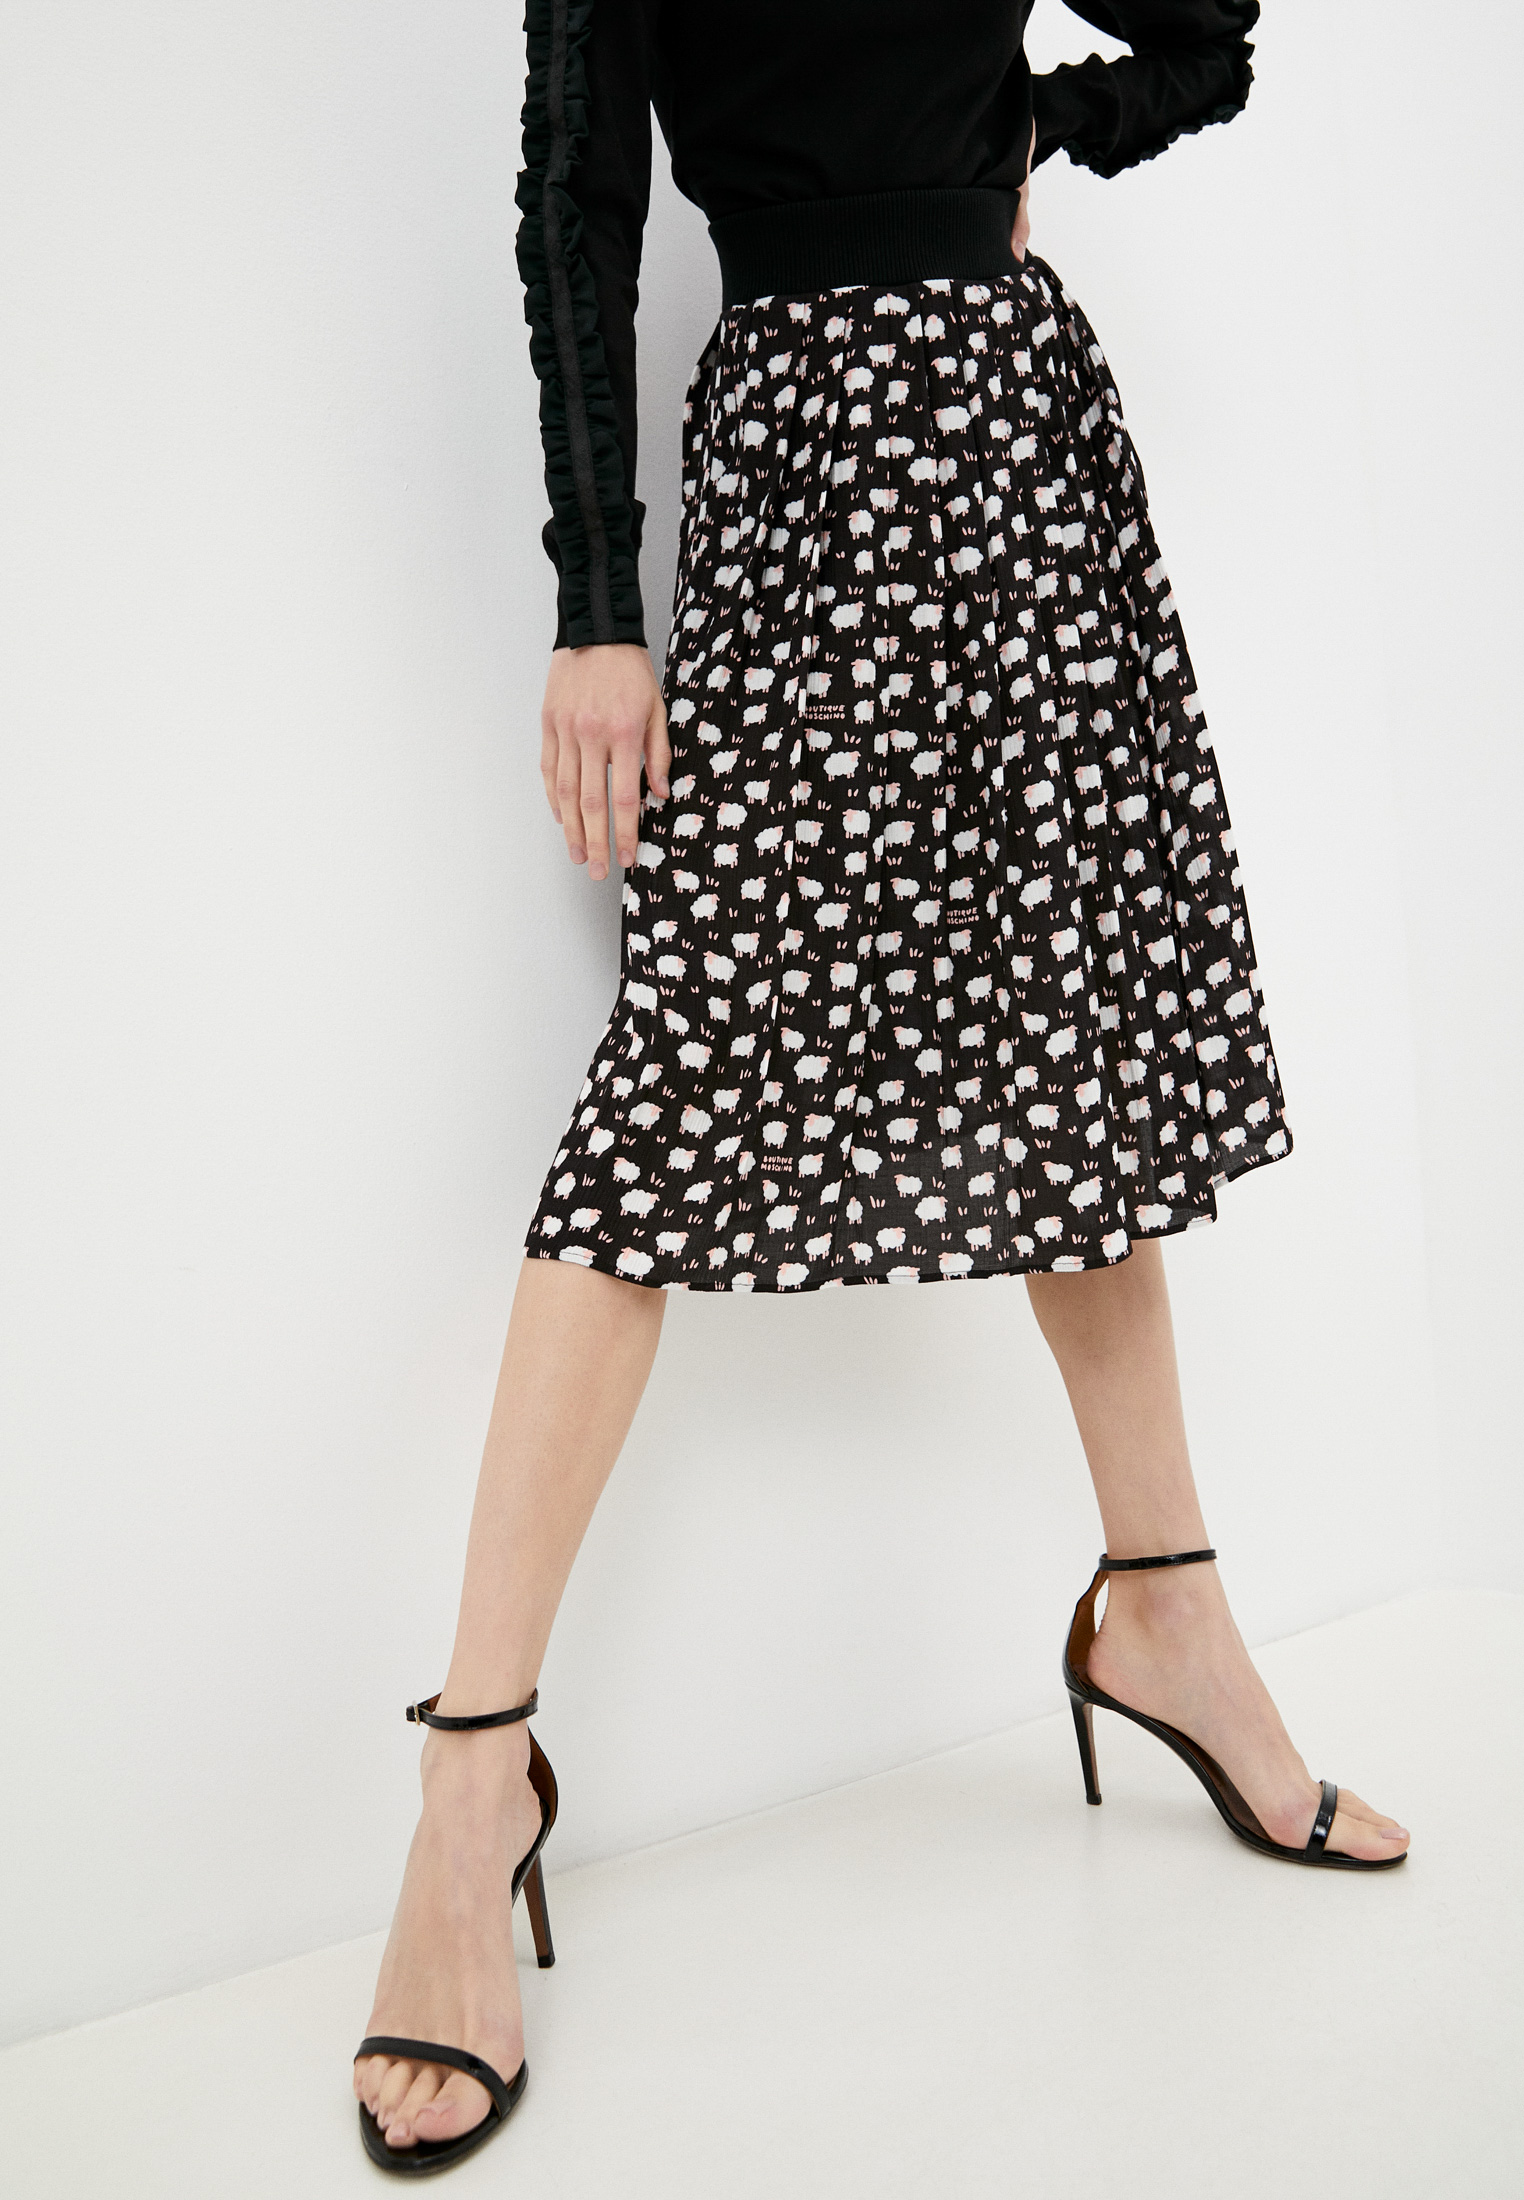 Широкая юбка Boutique Moschino Юбка Boutique Moschino